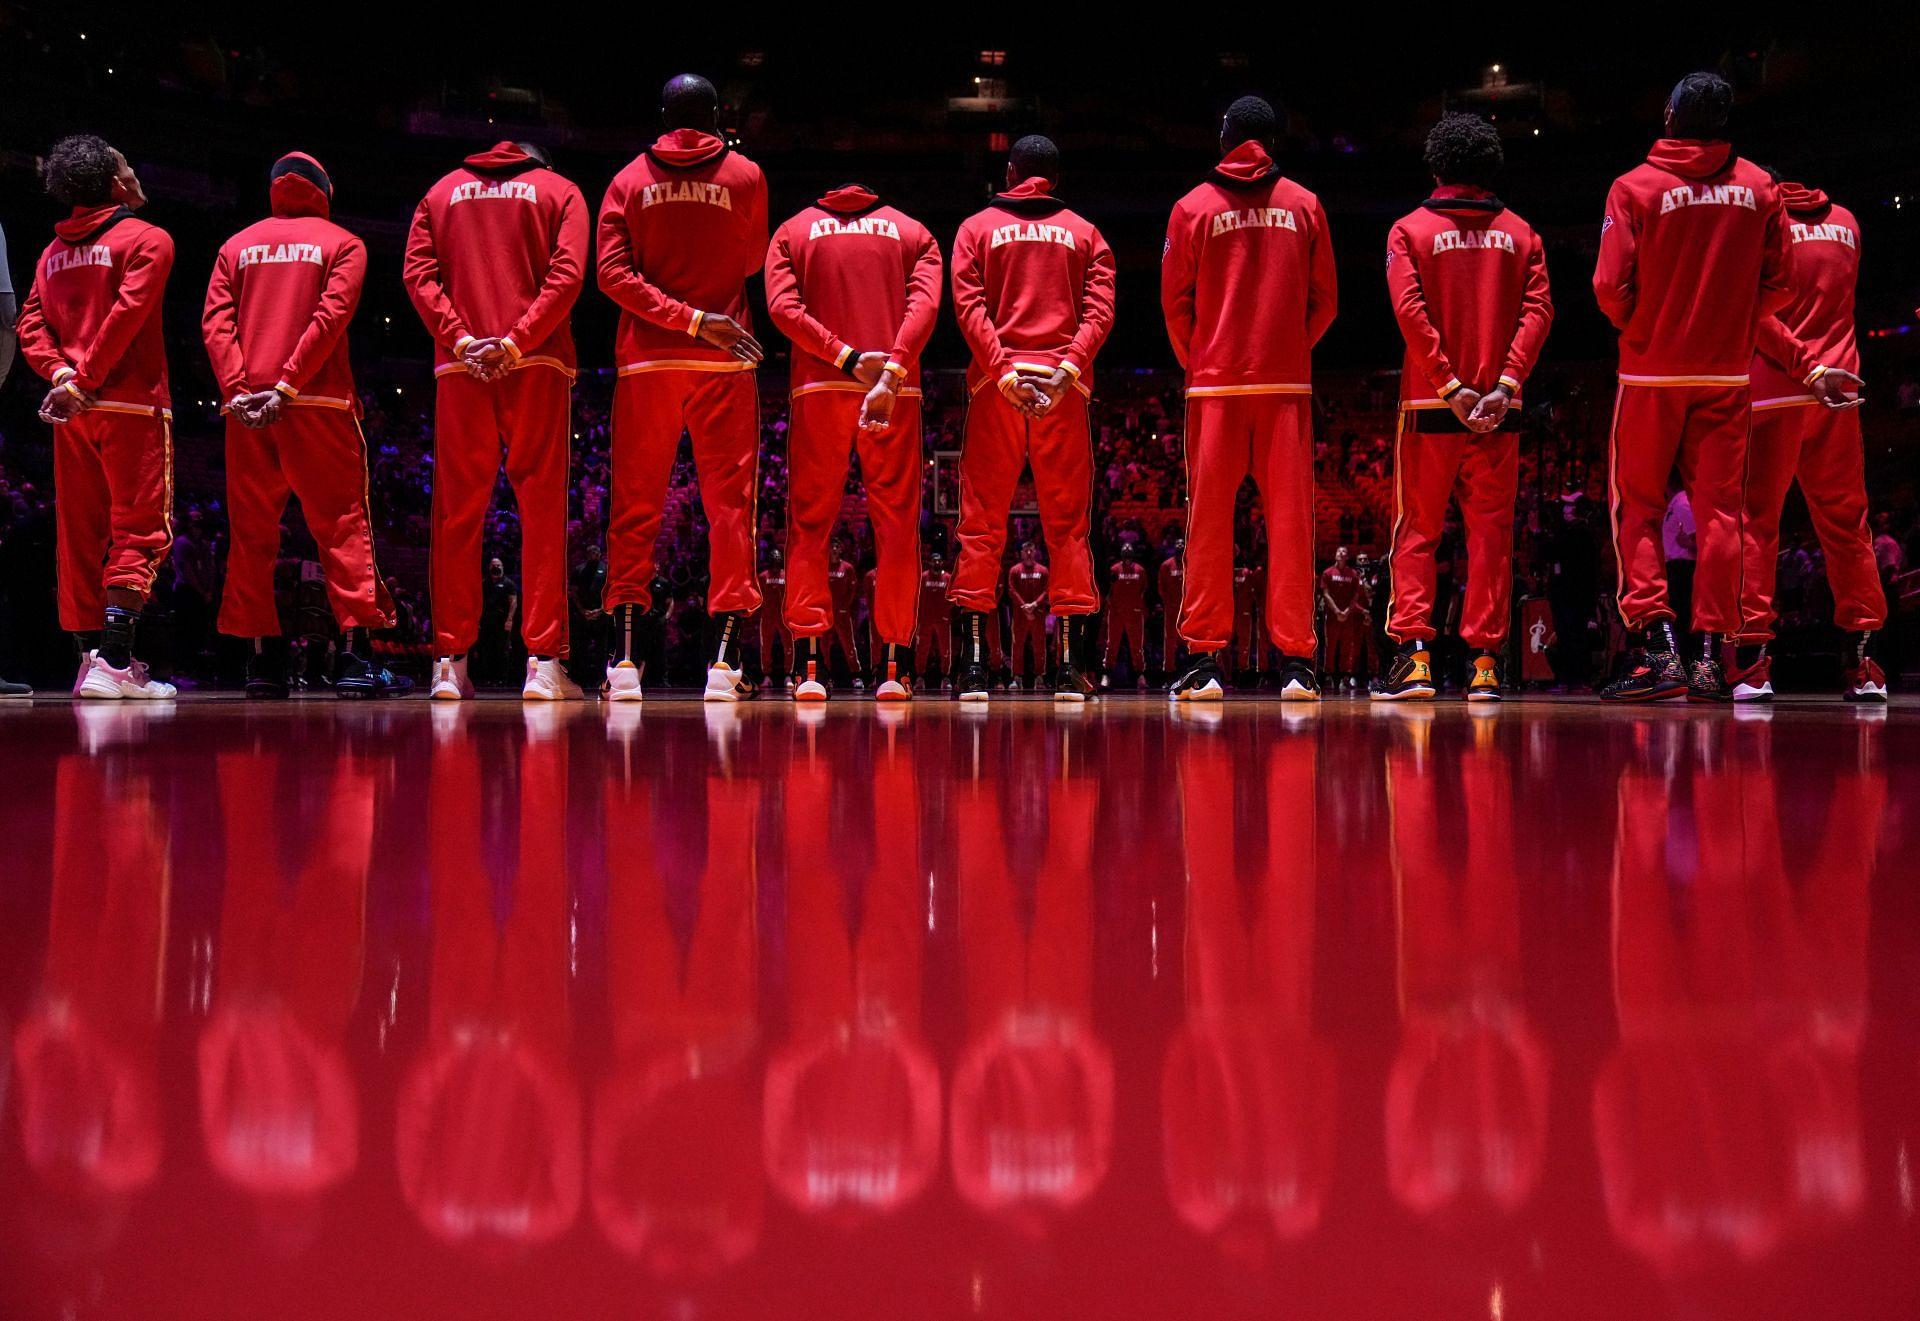 The Atlanta Hawks team introduction ahead of a game